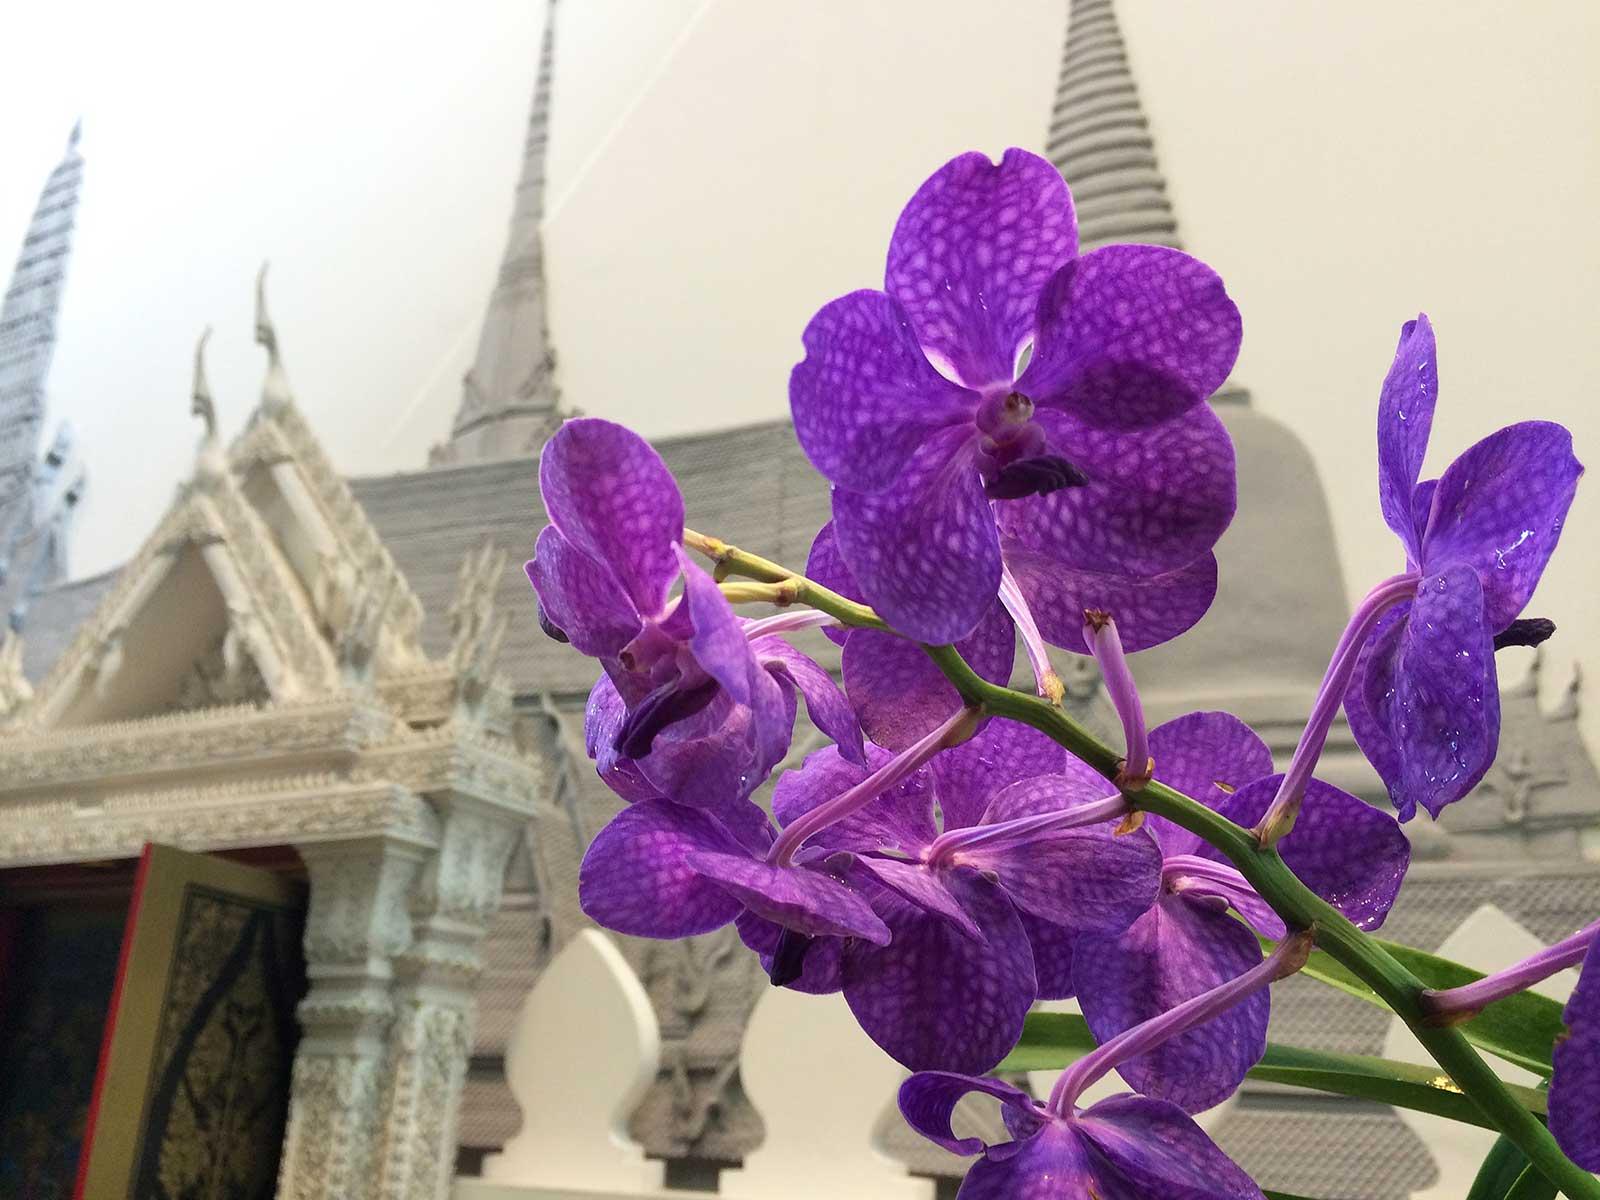 Suvarnabhumi havaalanı'ndaki orkideler